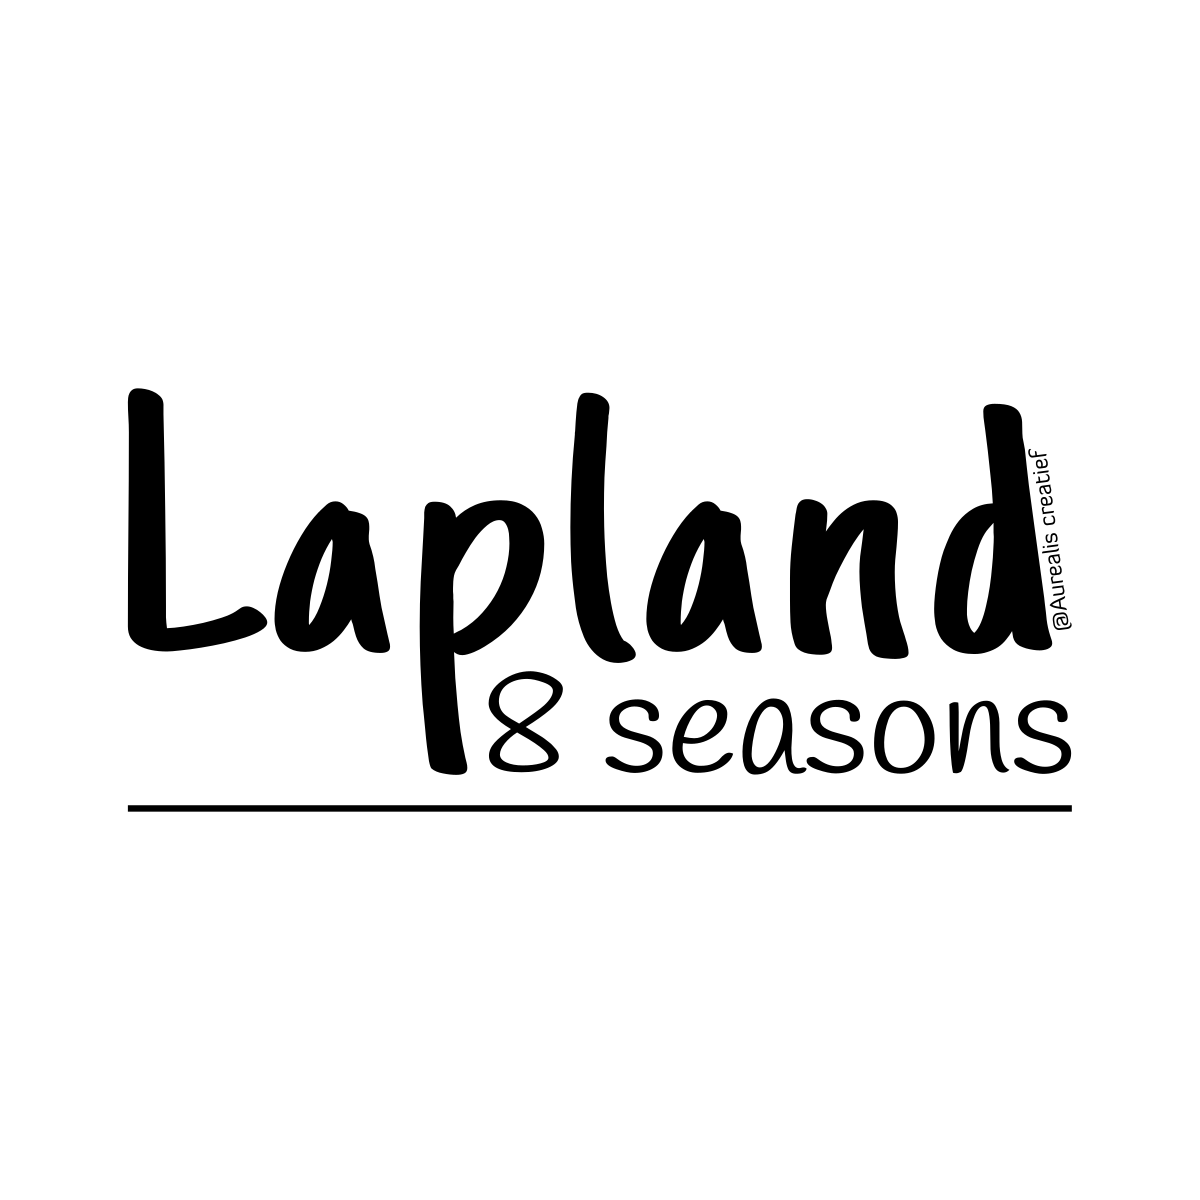 lapland.designs-8 seizoenen